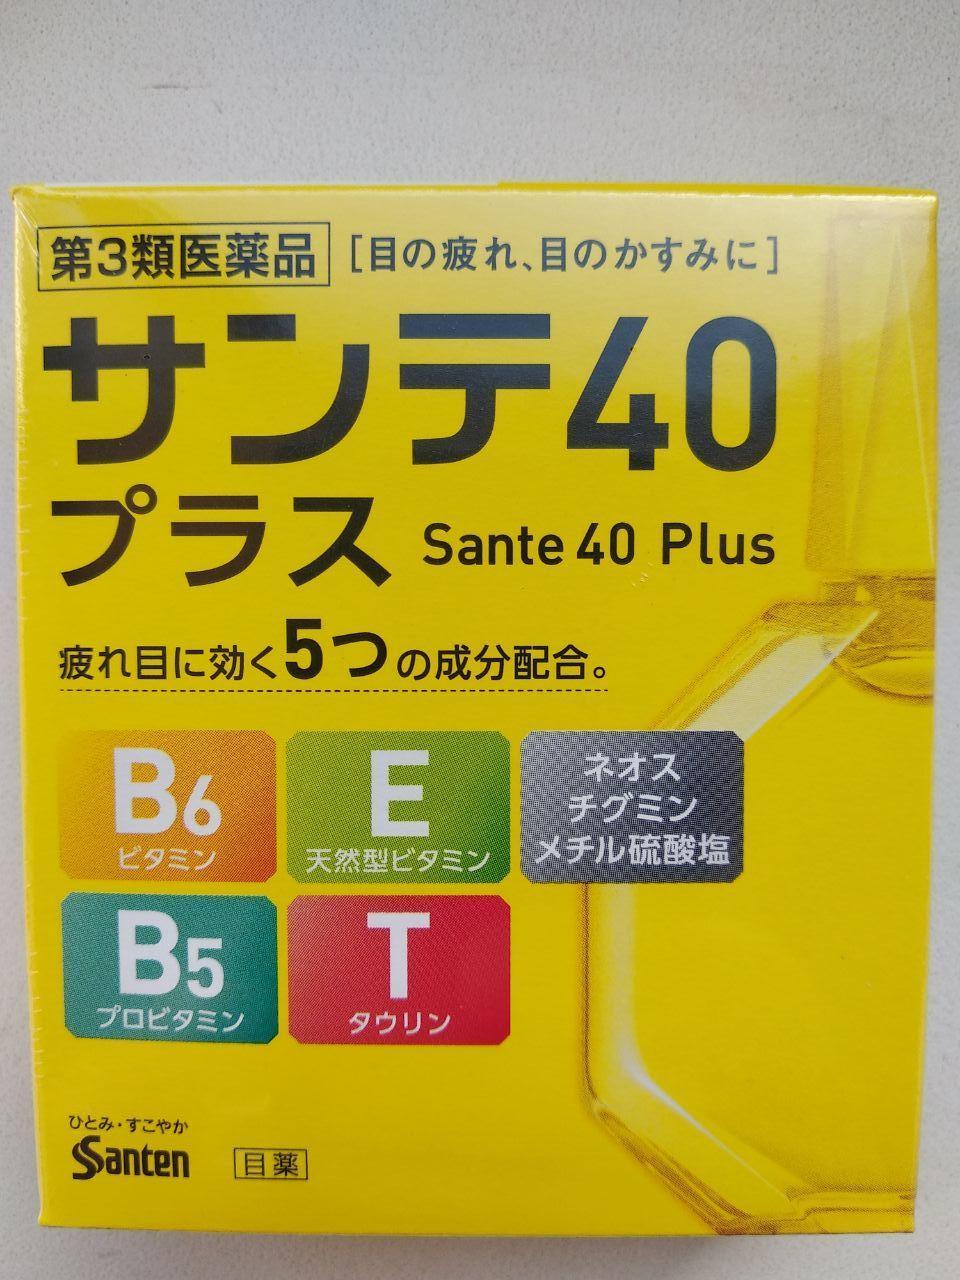 Японські очні краплі Sante 40 Plus